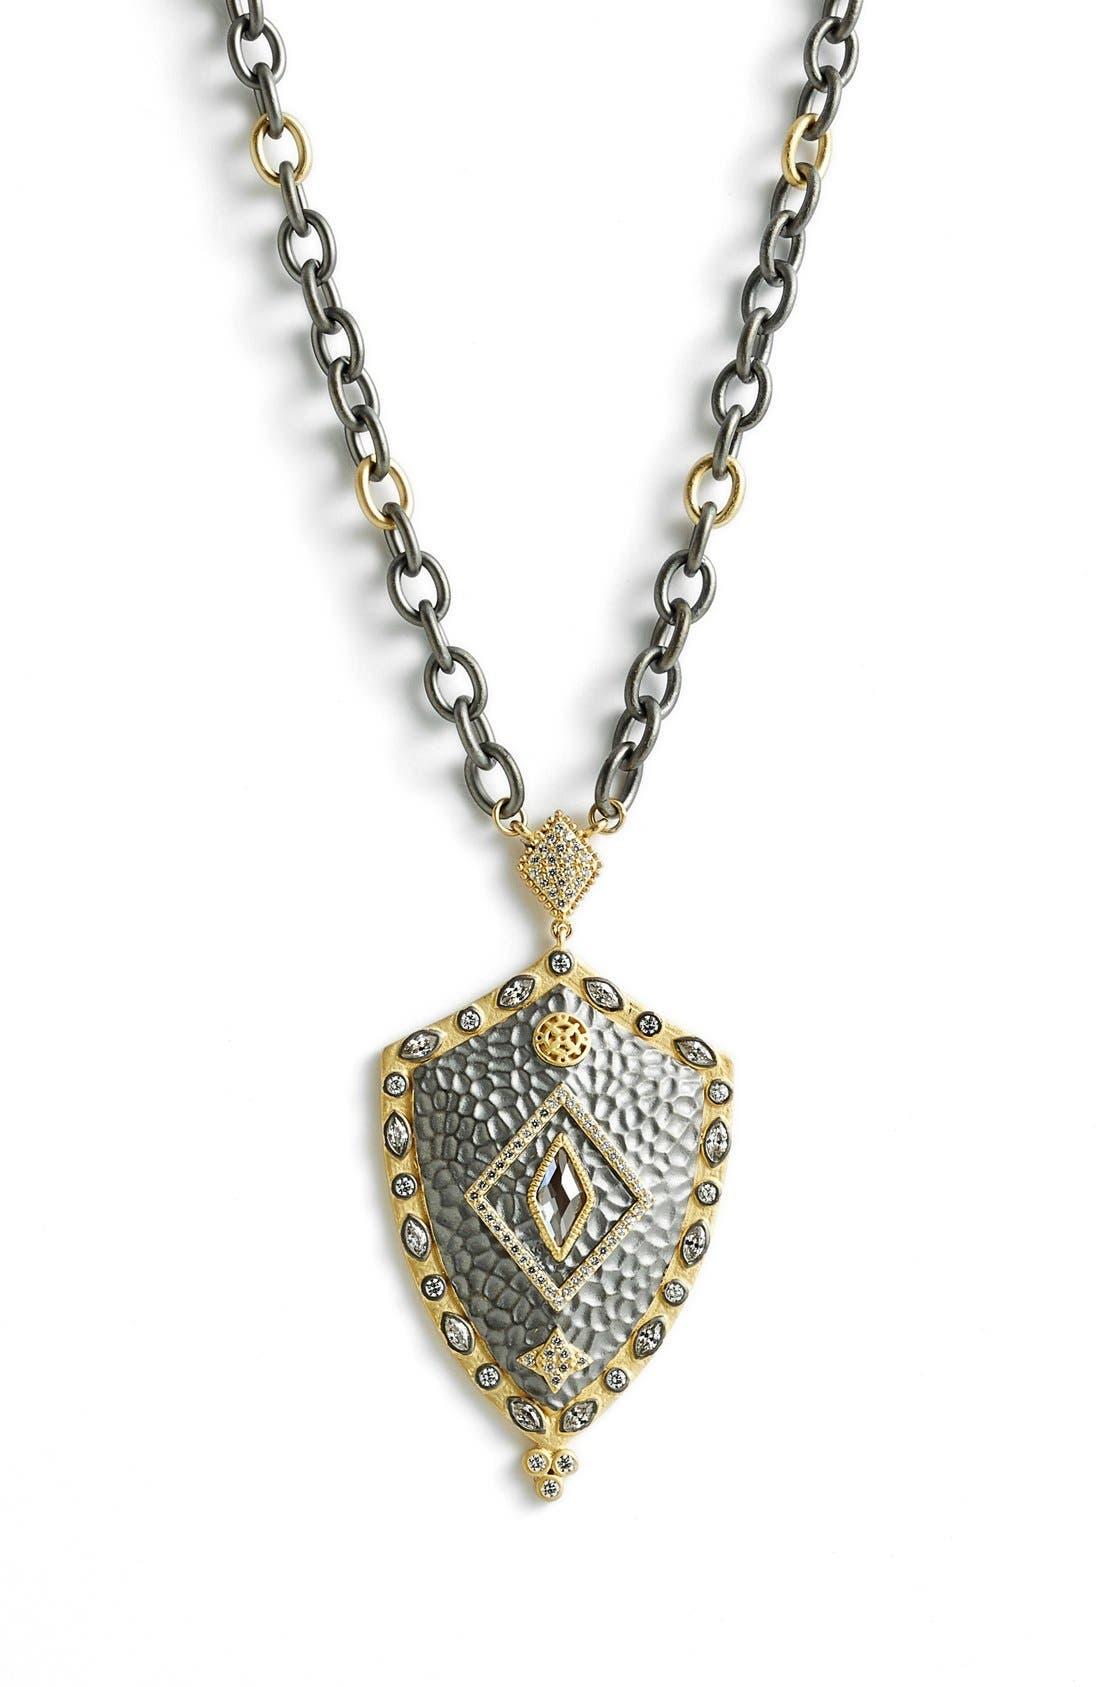 Alternate Image 1 Selected - FREIDA ROTHMAN 'Metropolitan' Shield Pendant Necklace (Online Only)